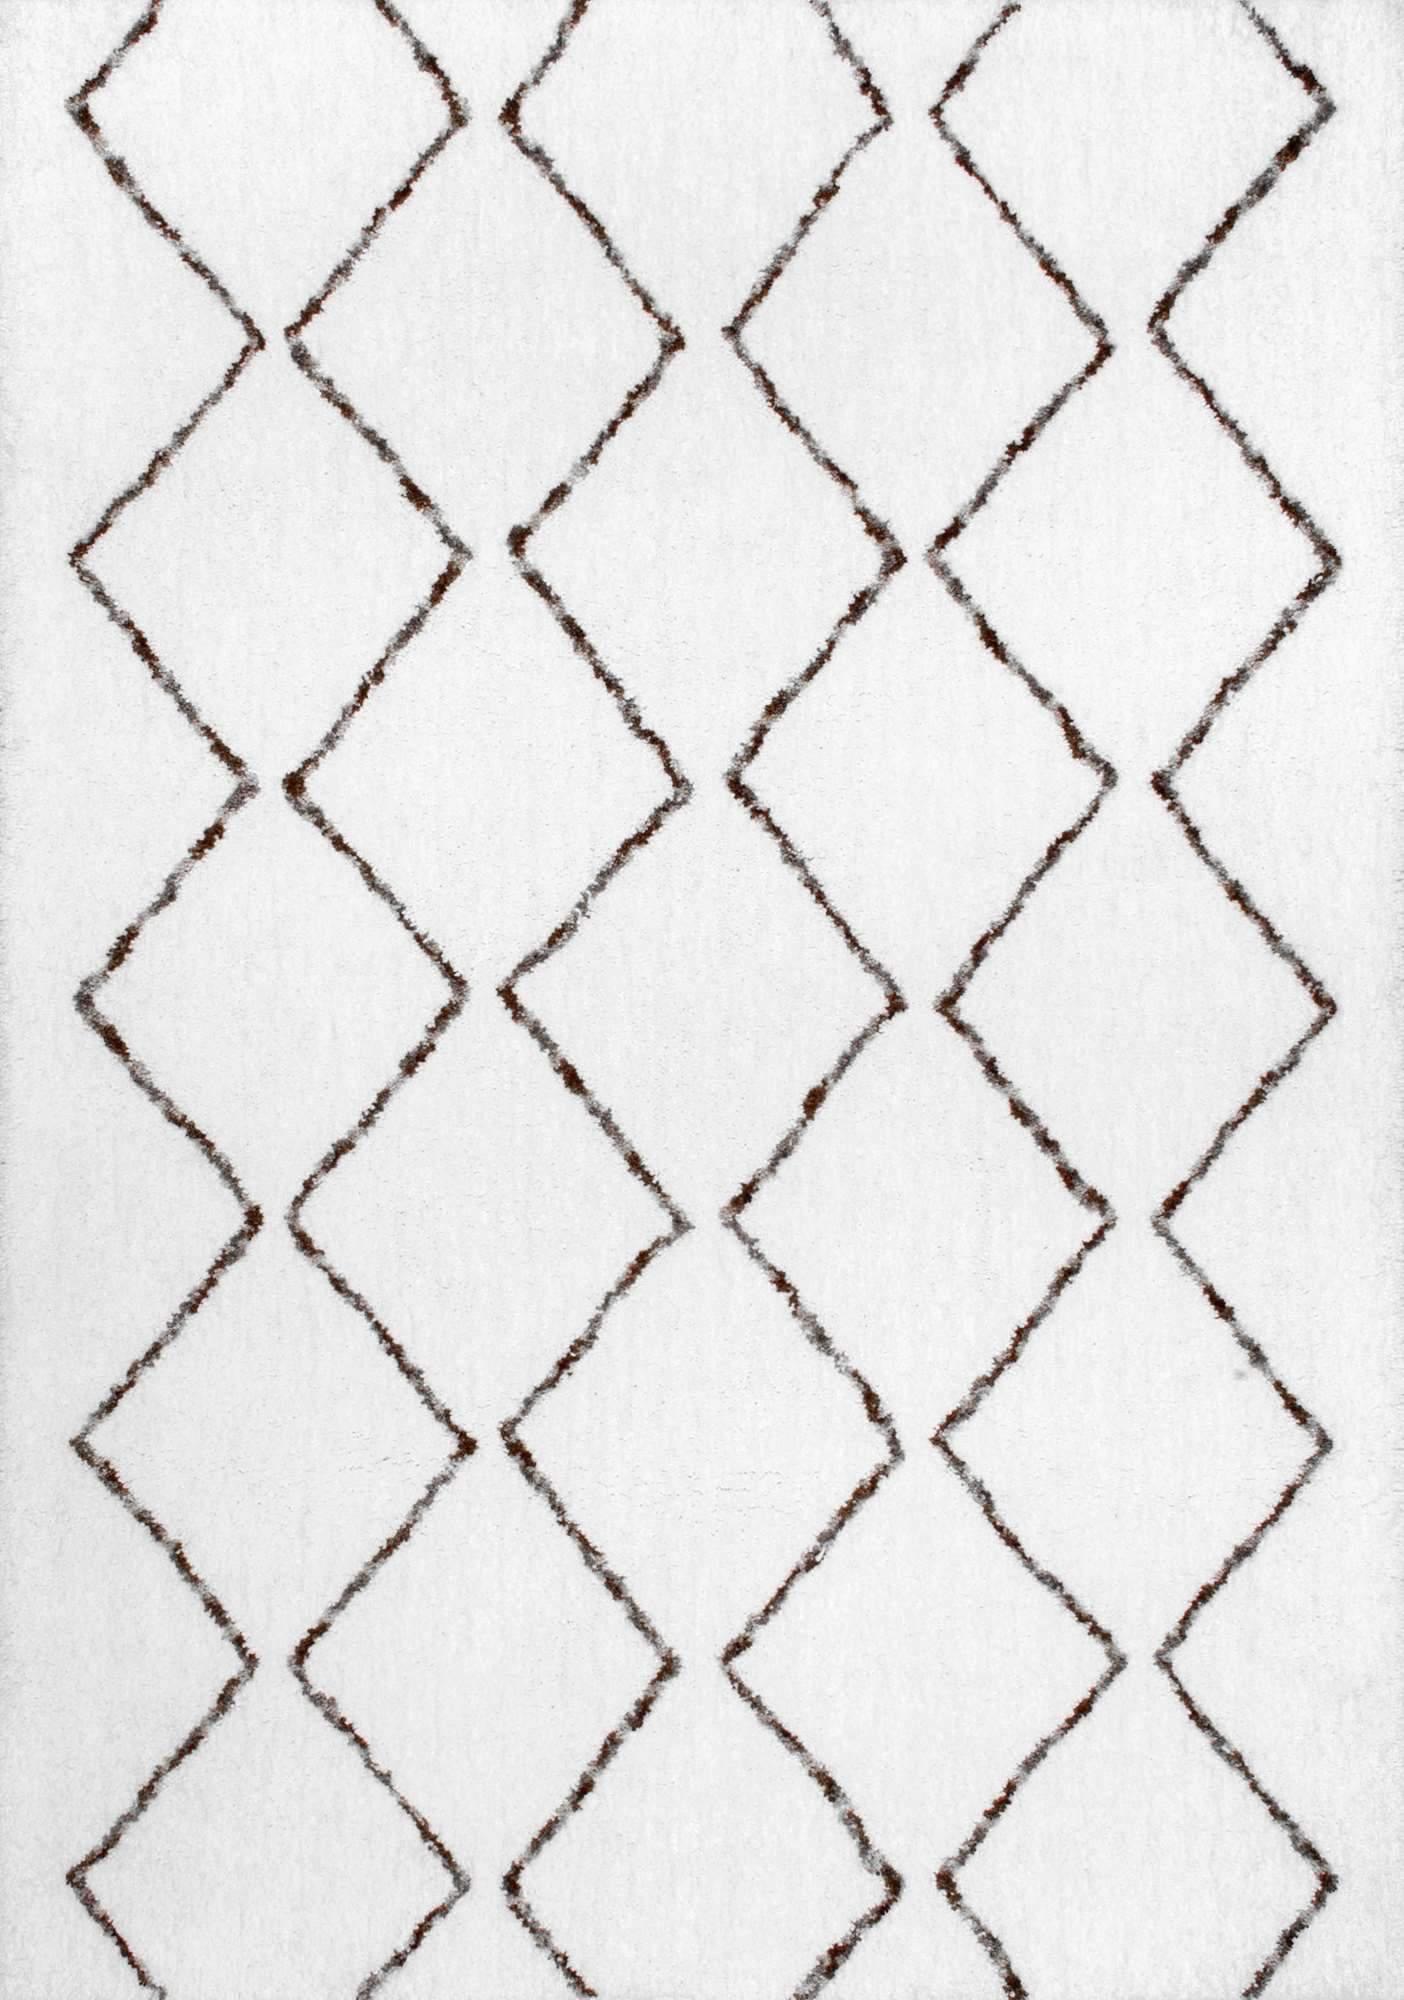 Hand Tufted Corinth Rug - 6' x 9'